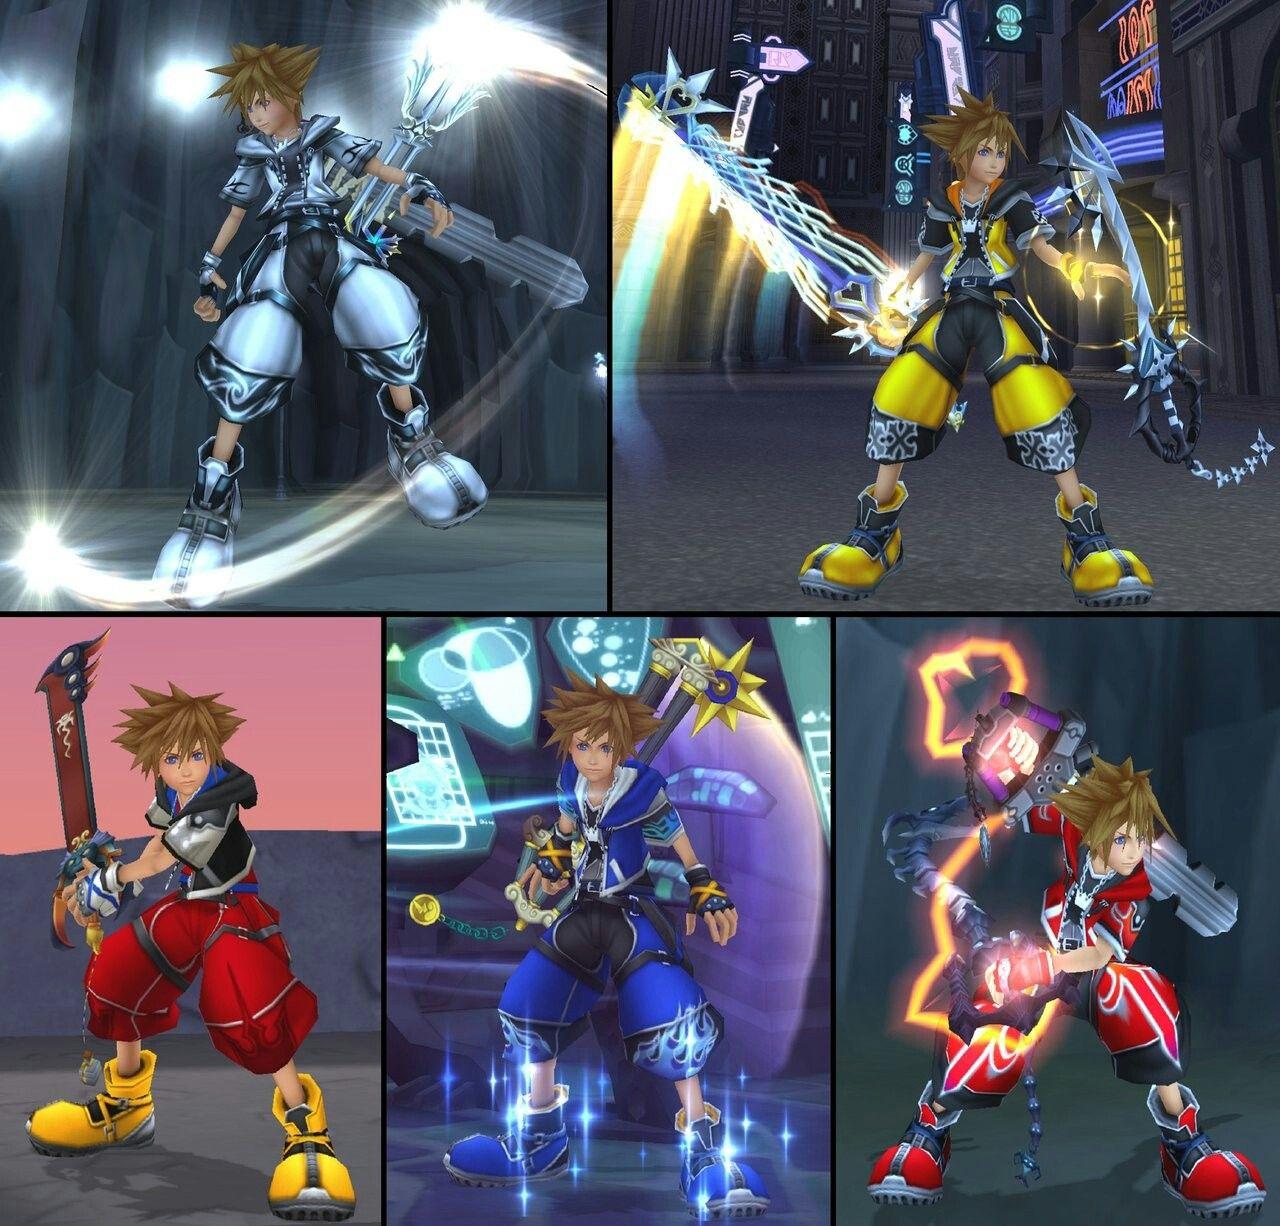 Sora Kingdom Hearts Kingdom Hearts: Keyblade Weilding Sora Forms